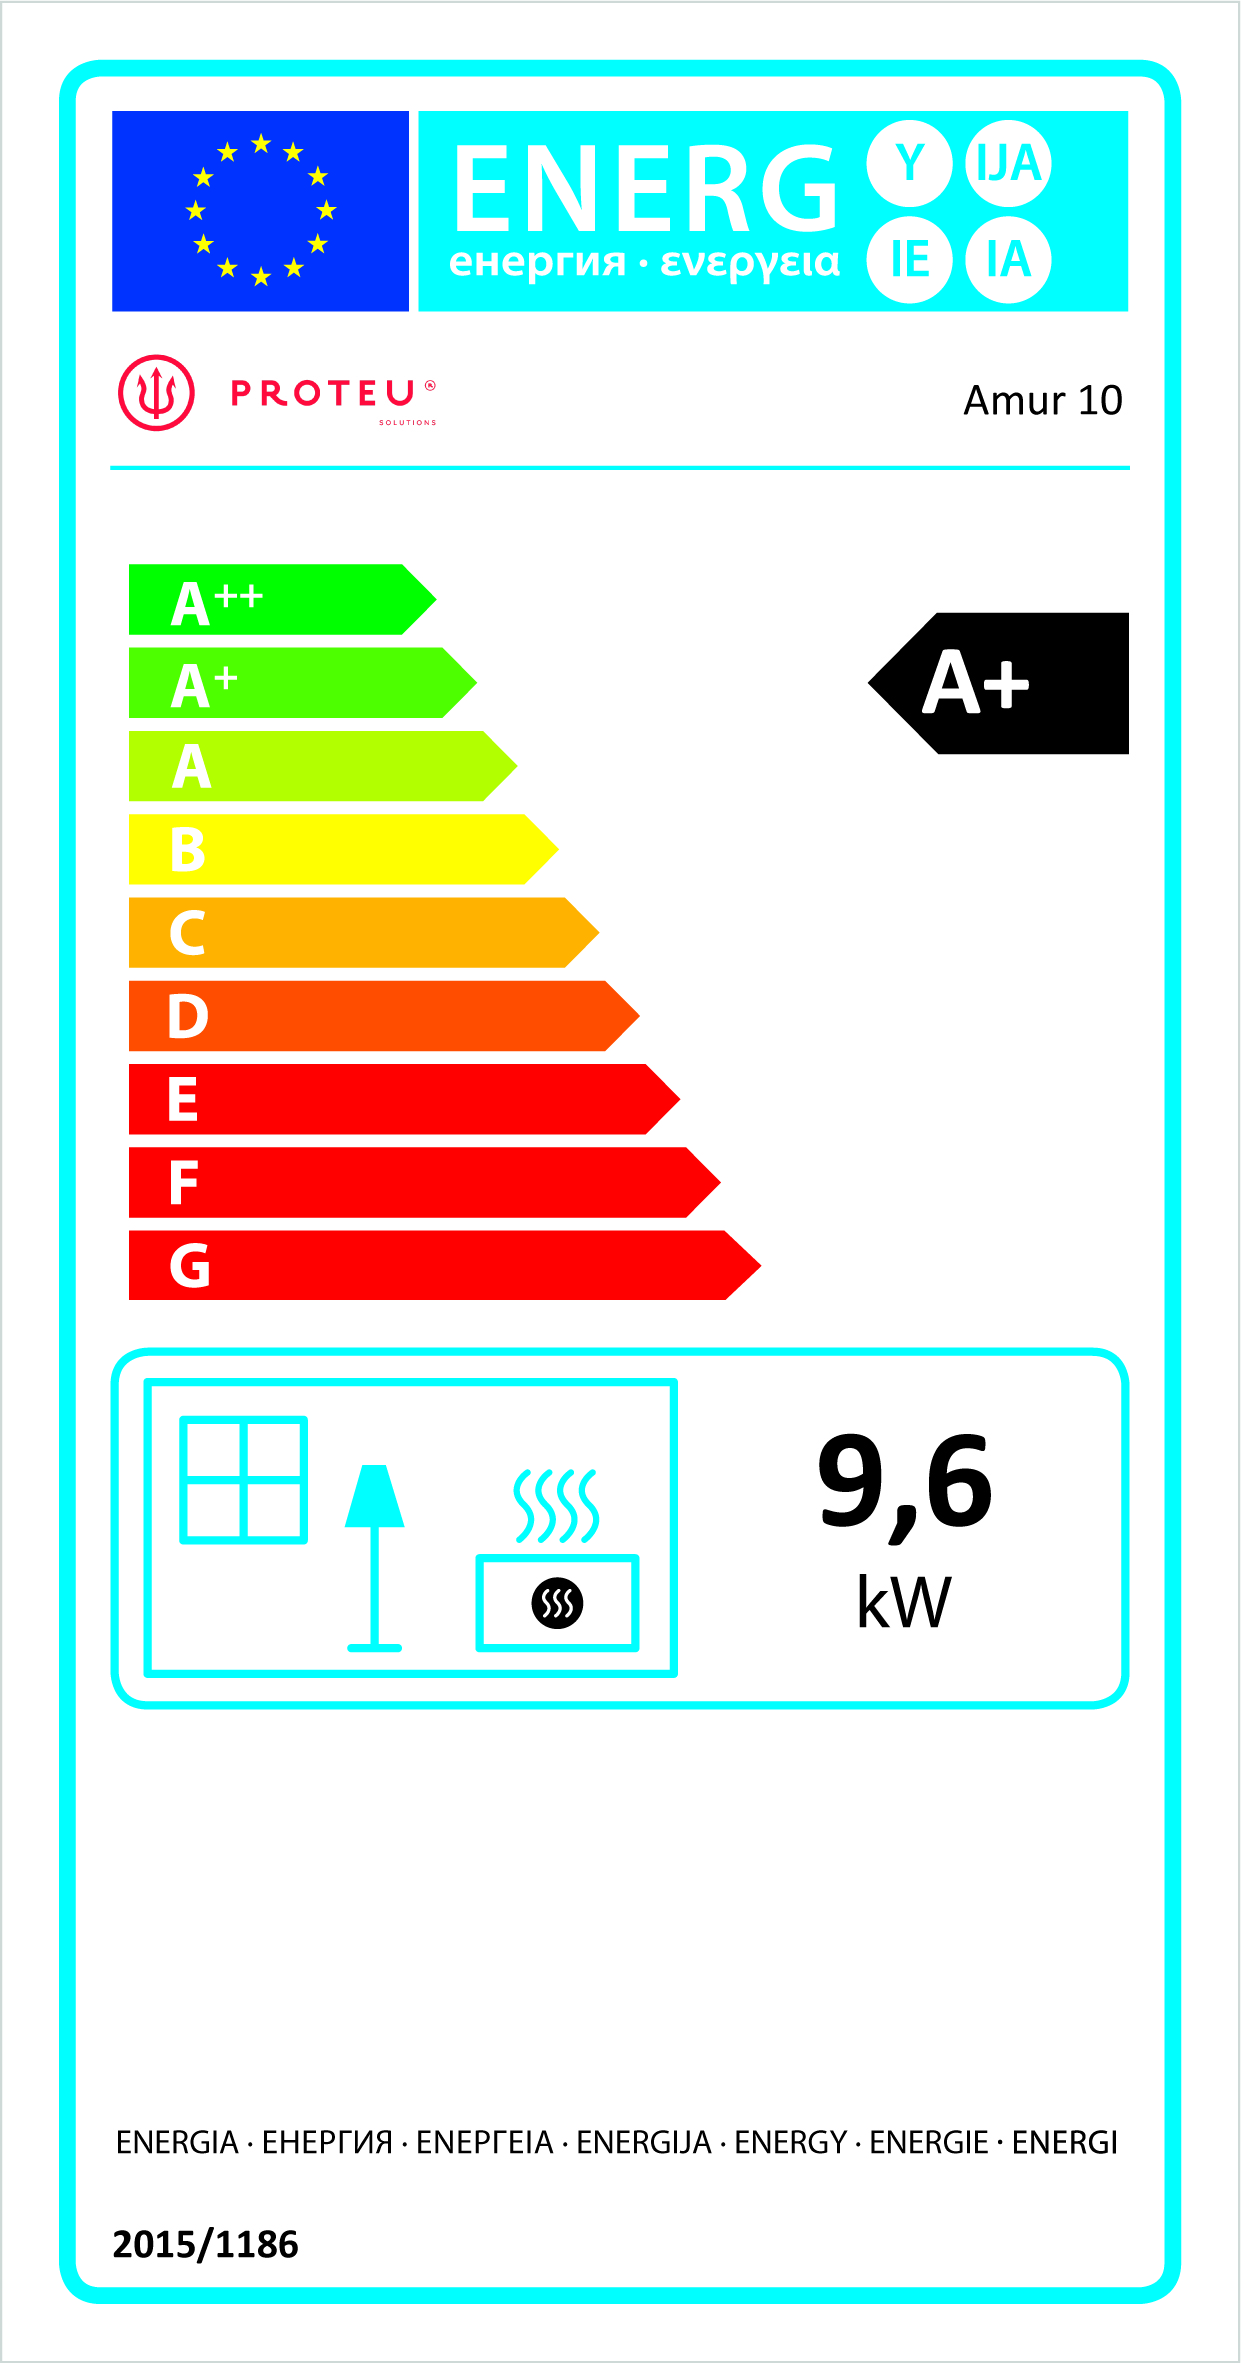 Etiqueta Energética Amur 10